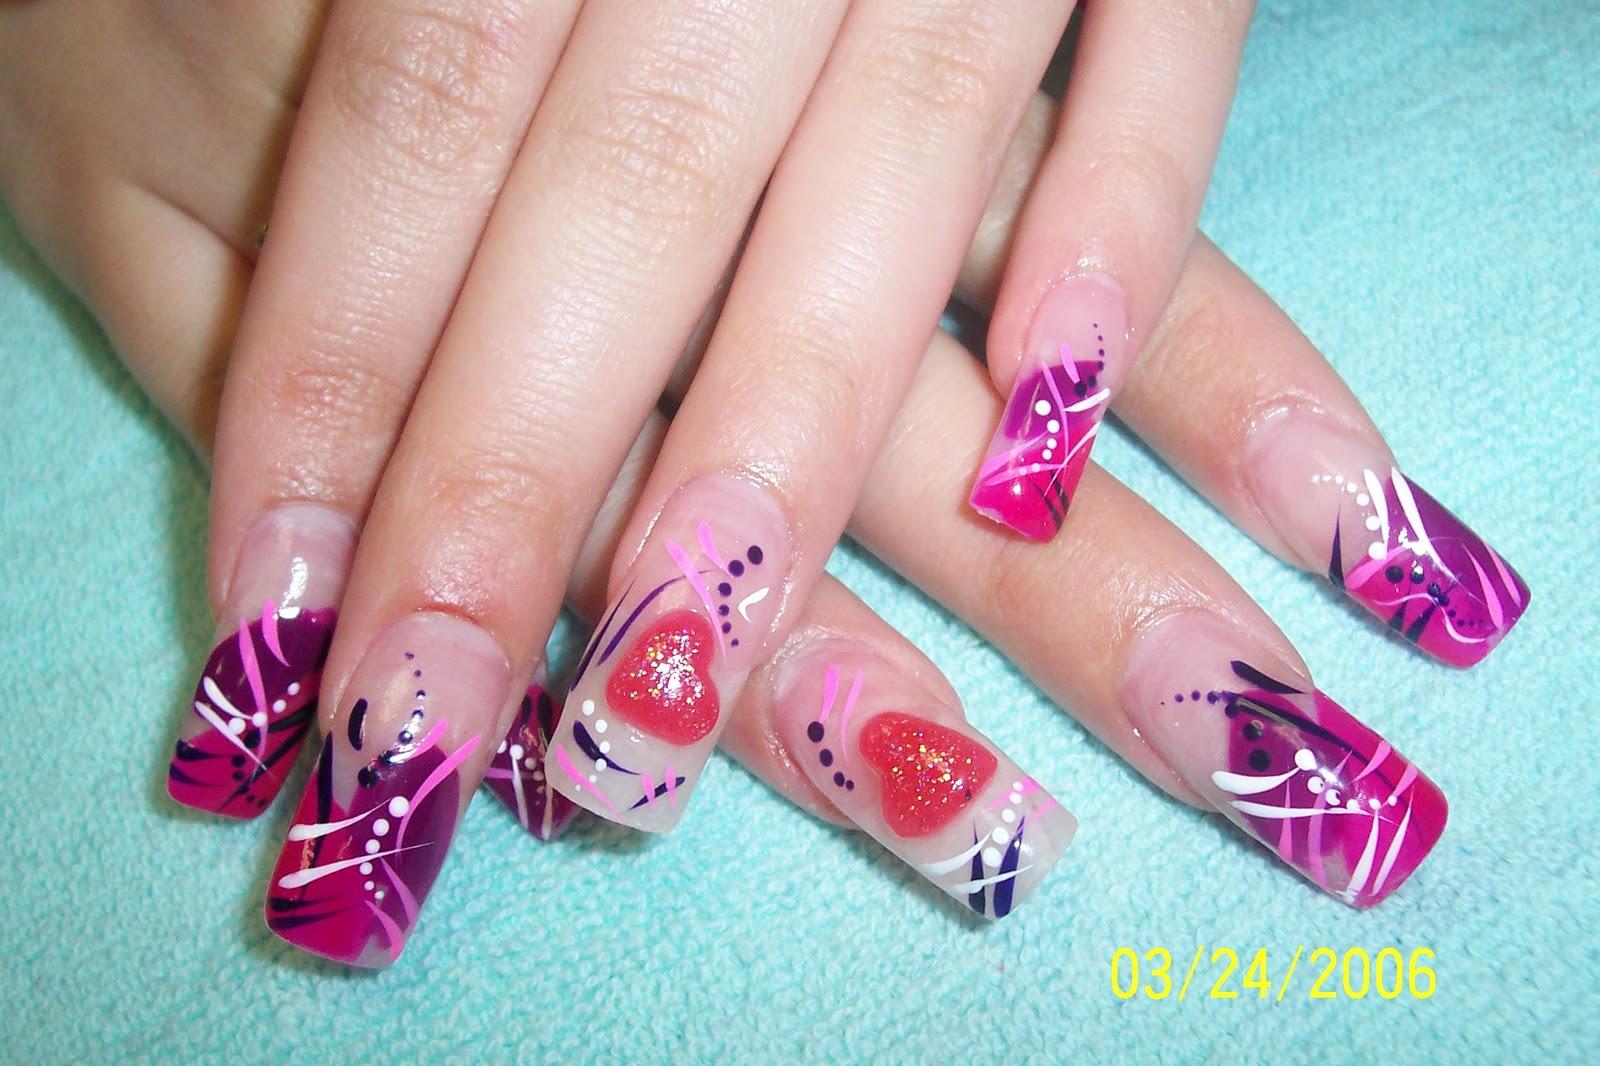 Nail Art Designs trend